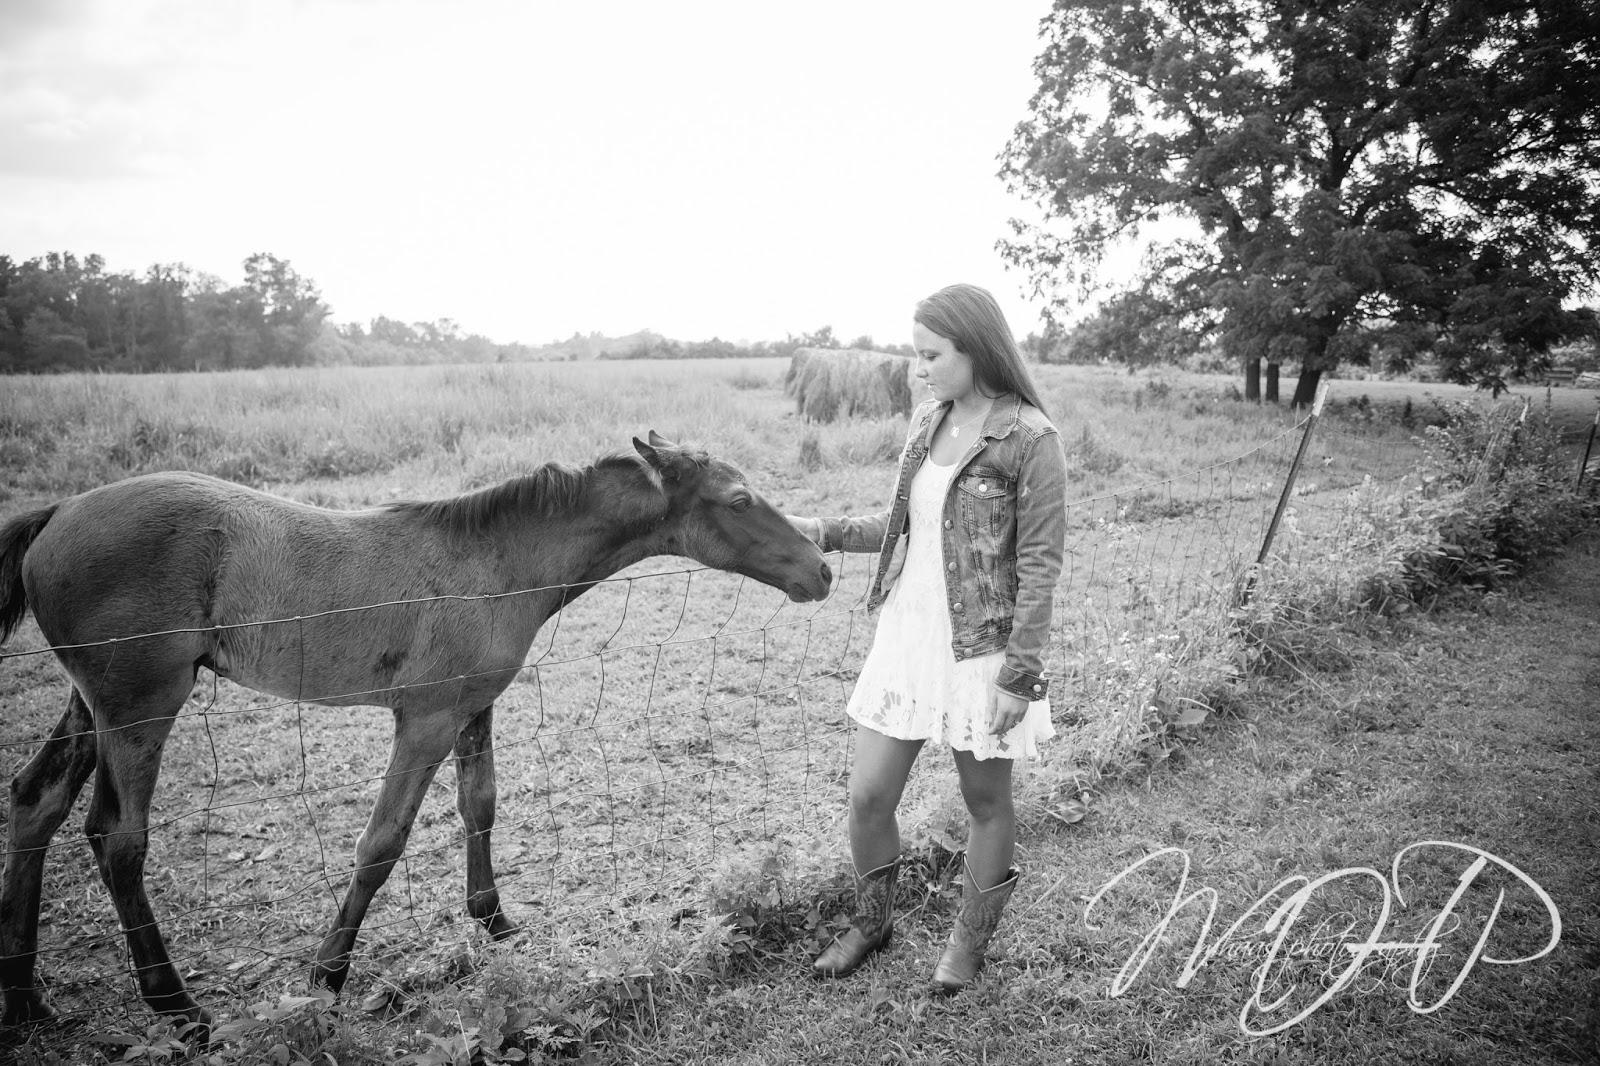 ©2015 MHaas Photography, senior portrait photographer, high school, senior pictures, louisville senior portrait photographer, horse, barn, rustic, cheerleader, Blackacre, farm, class of 2016, Assumption High School